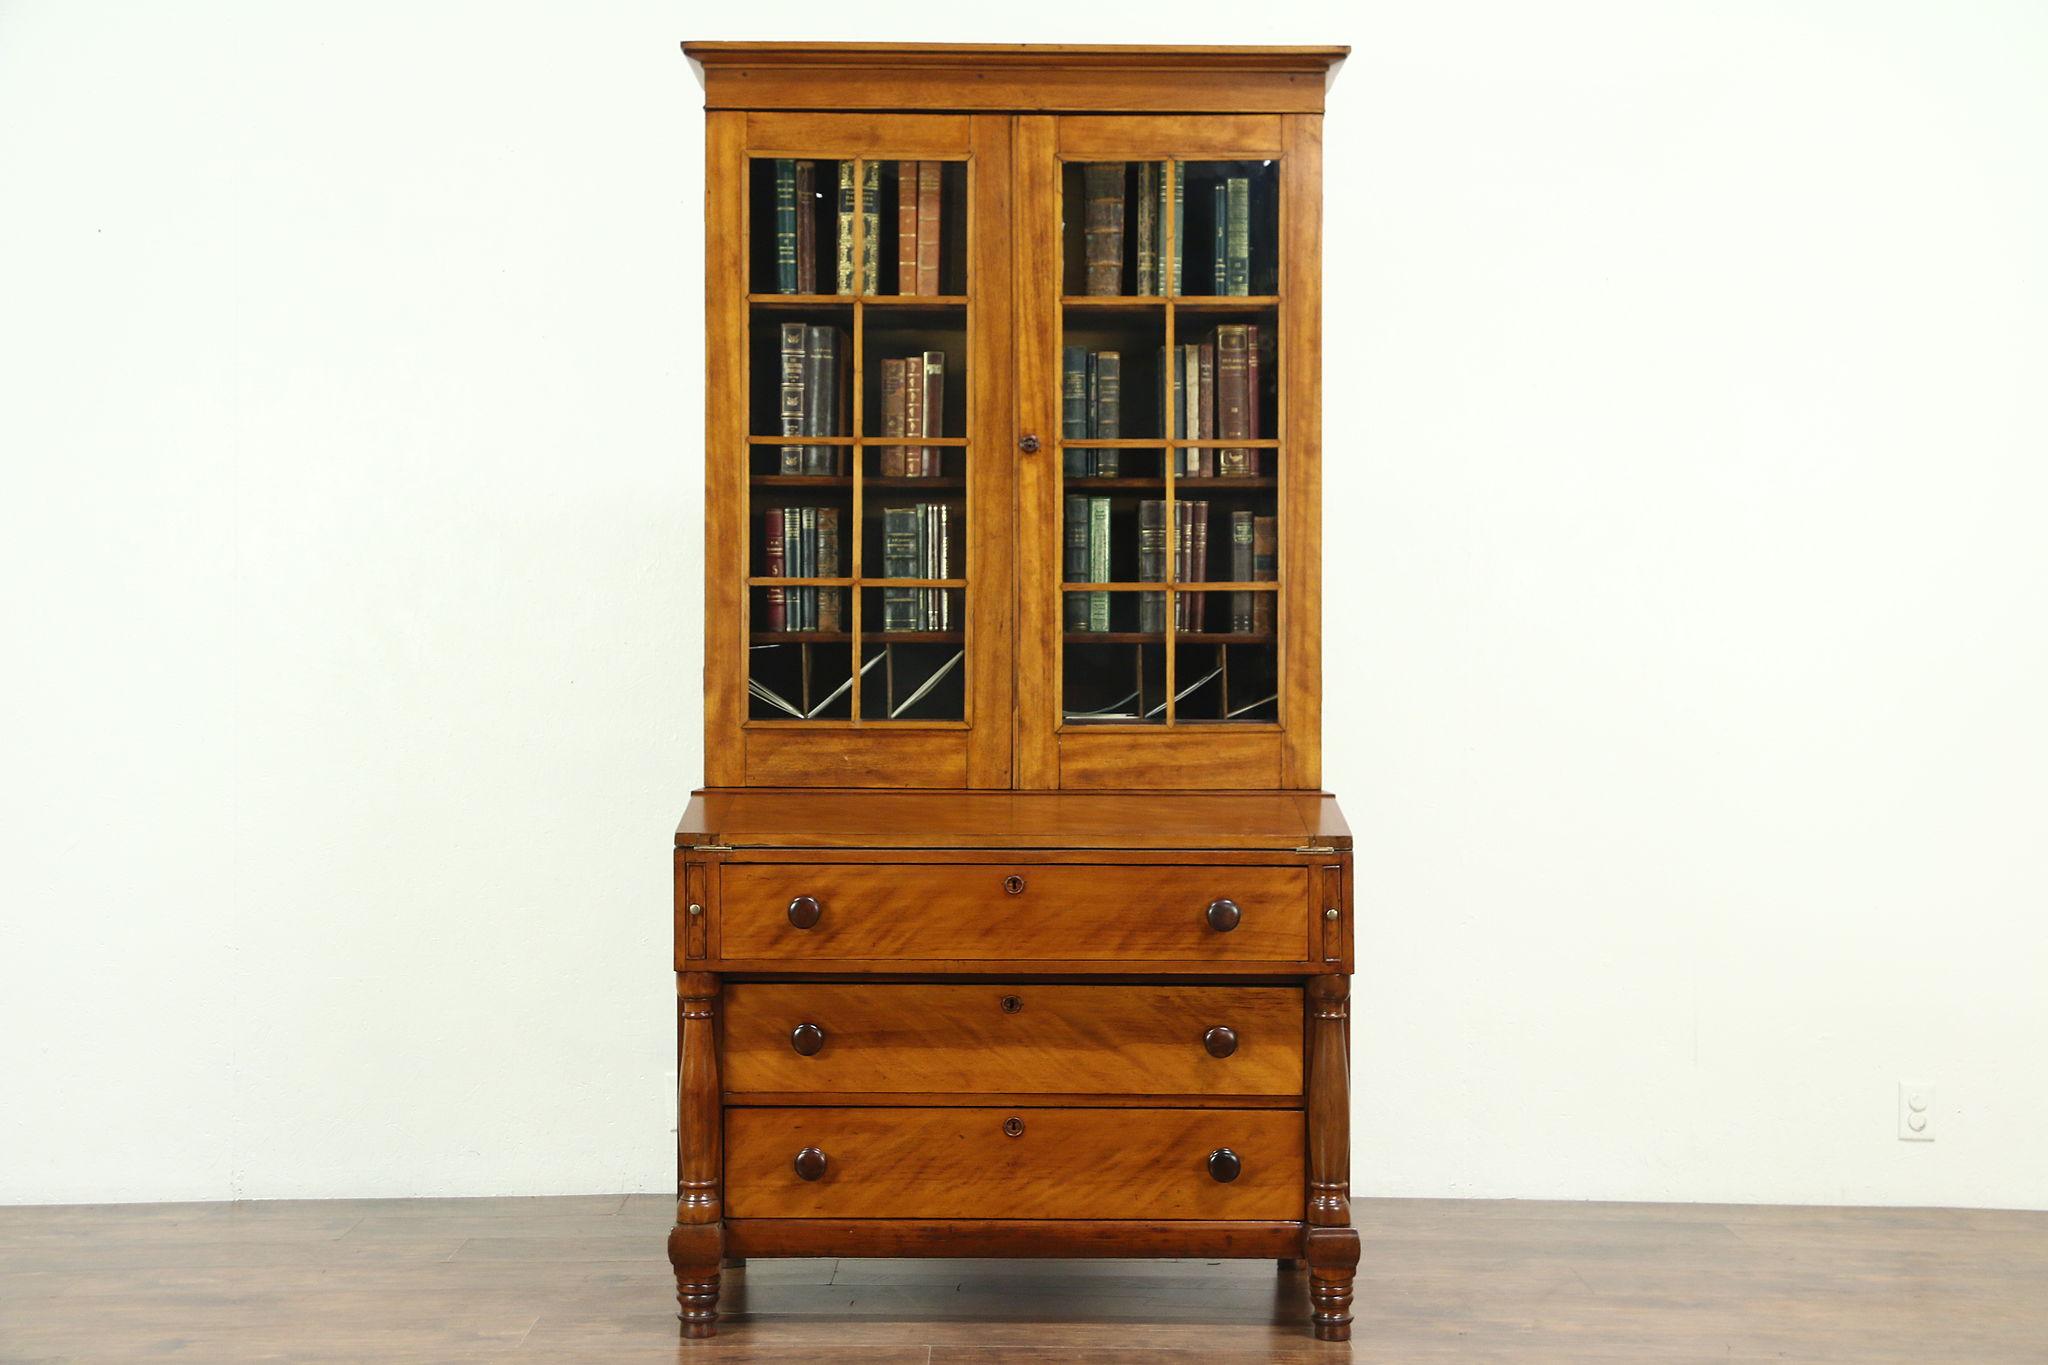 Sold Secretary Desk Wavy Glass Bookcase Curly Birch 1825